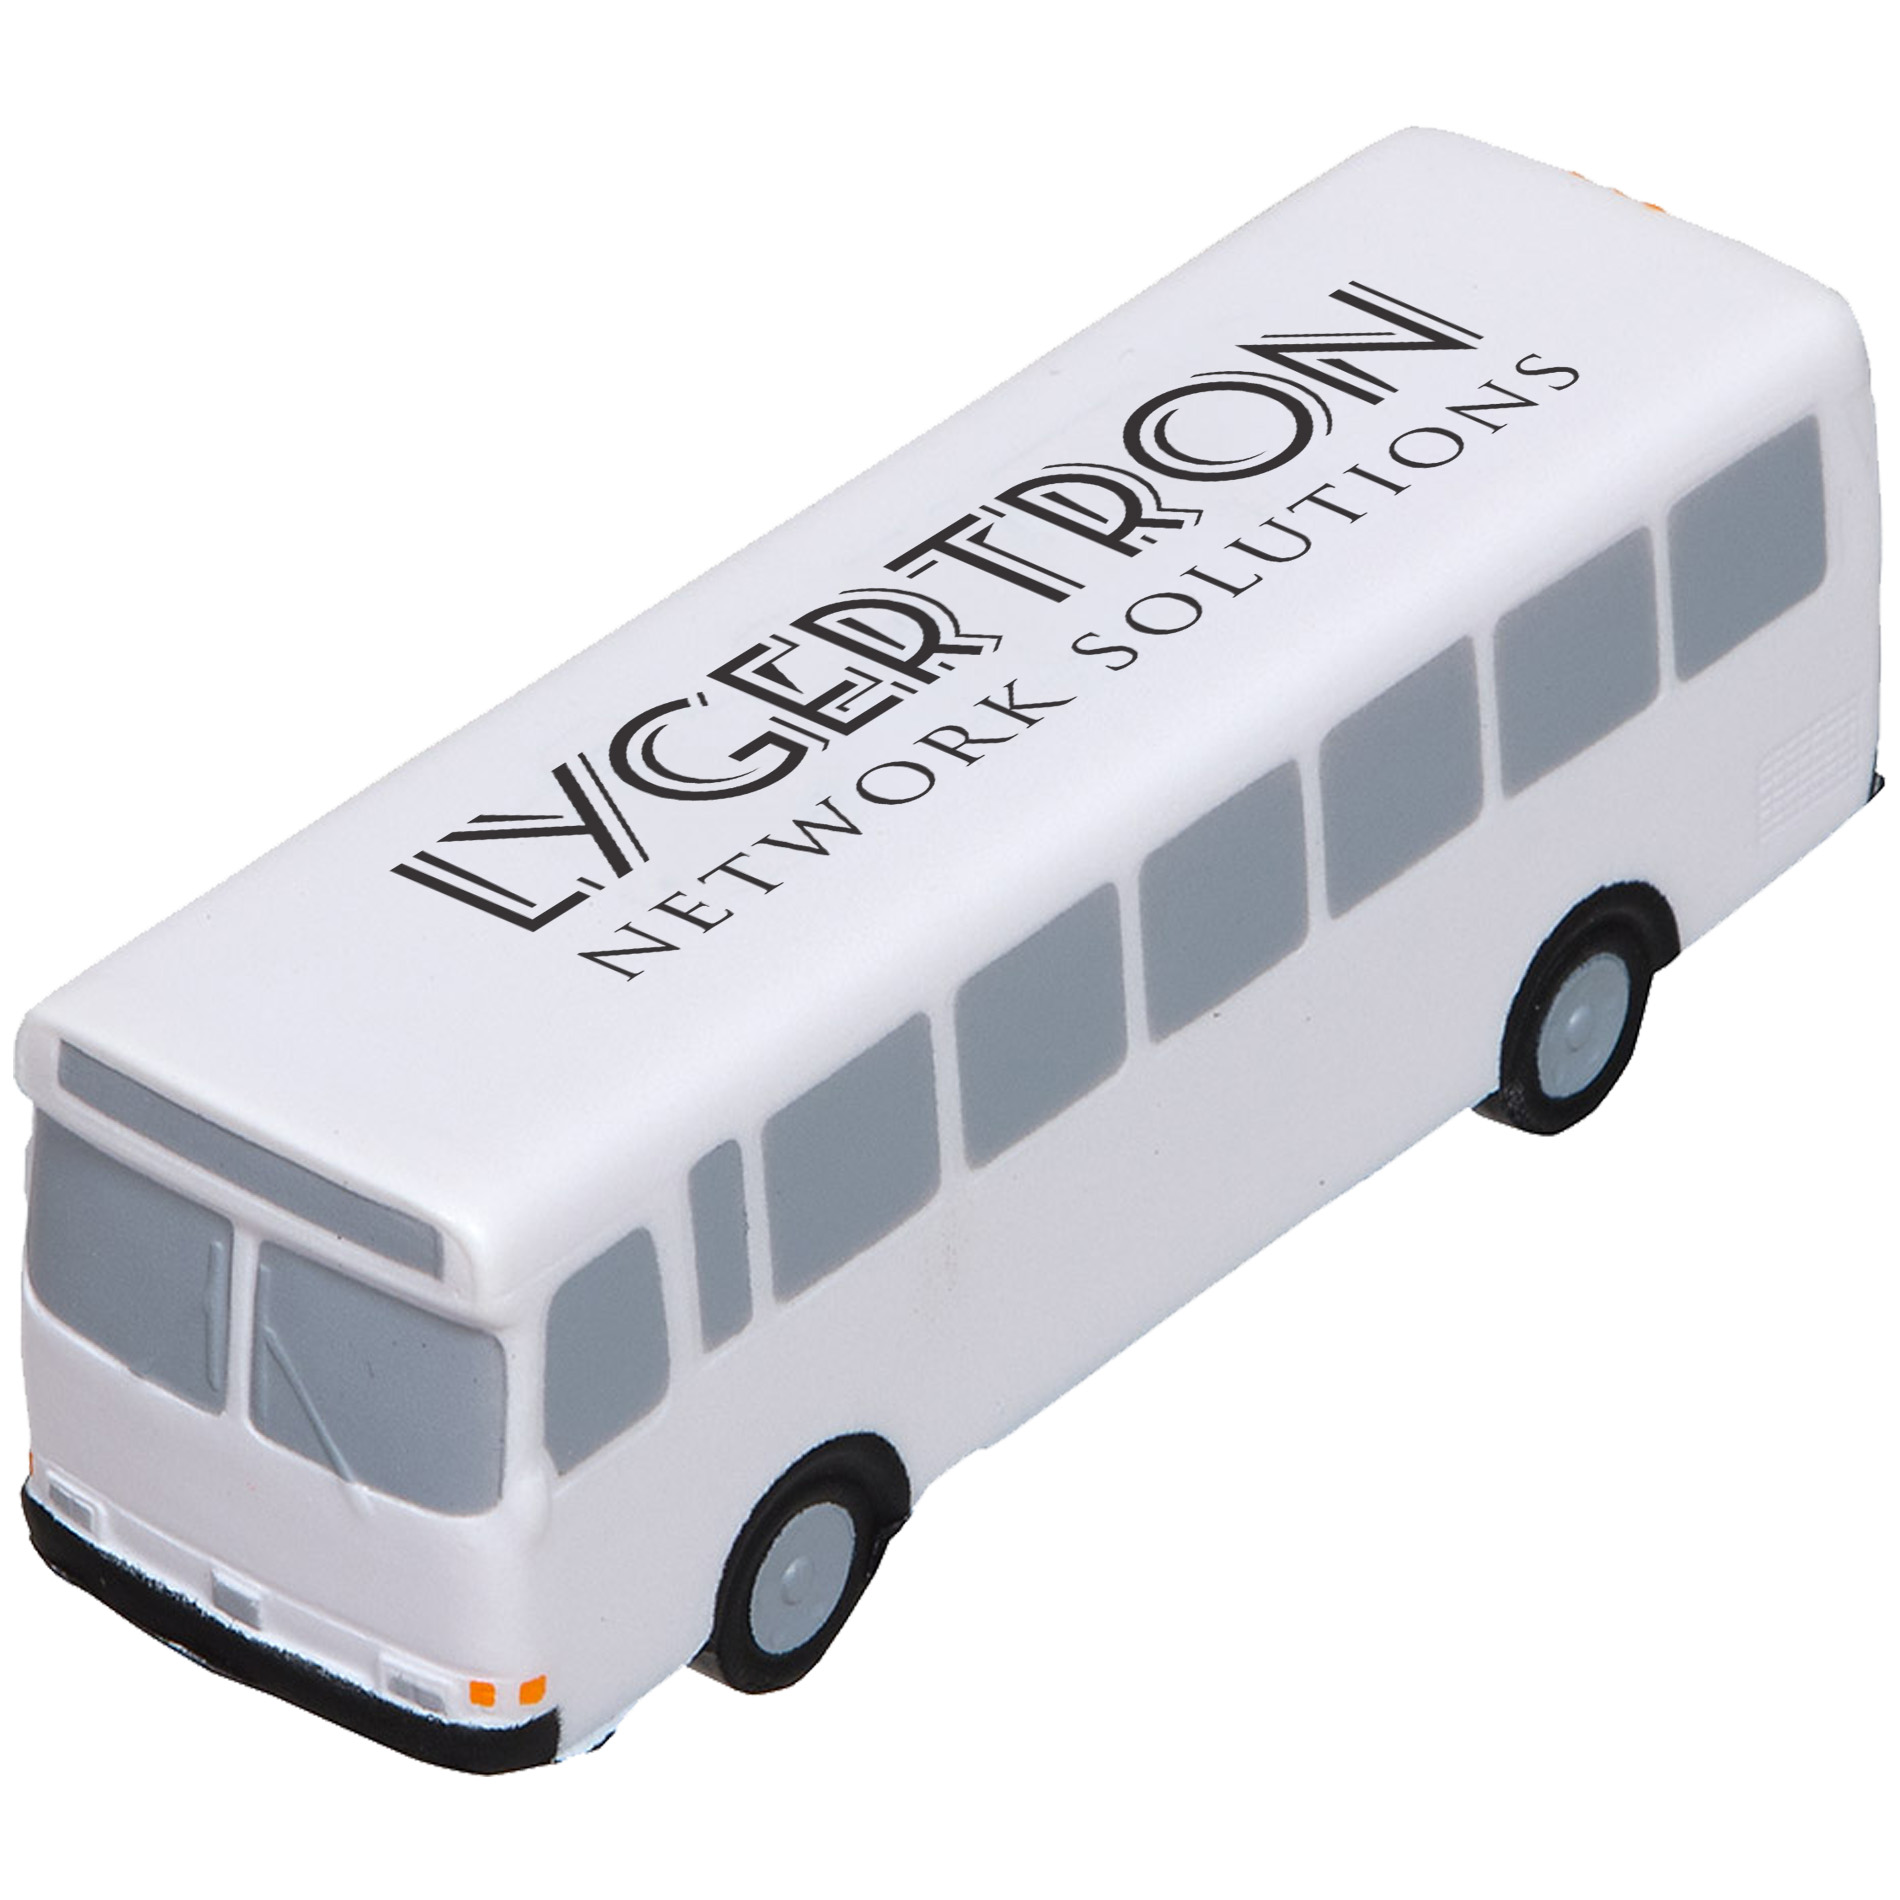 Metro Bus Stress Reliever